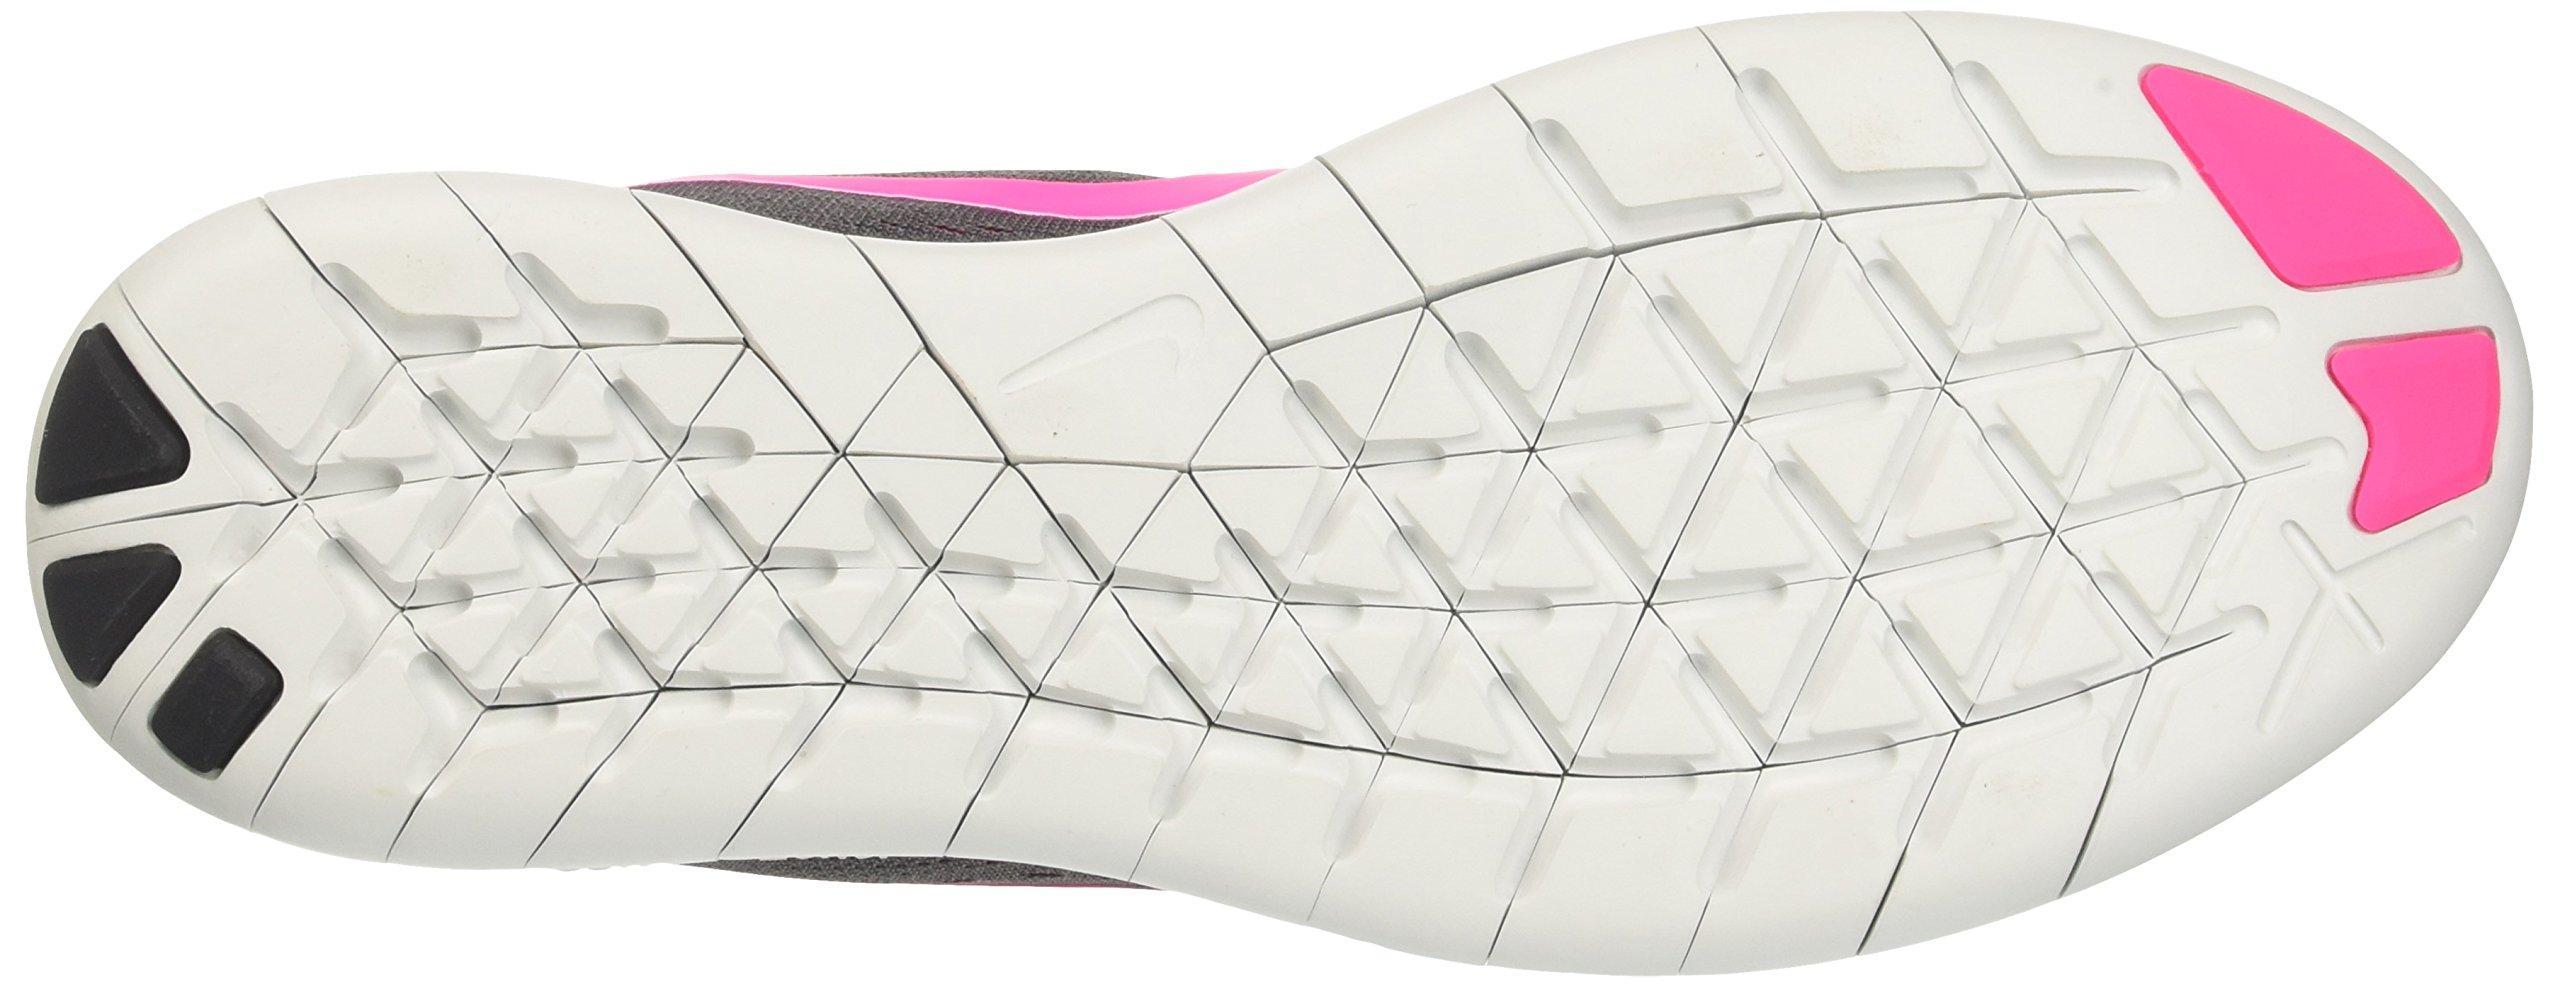 Mujeres Nike Free Rn 831509006 Zapatillas Dark Grispink Blast 831509006 Rn Tamaño ce7862